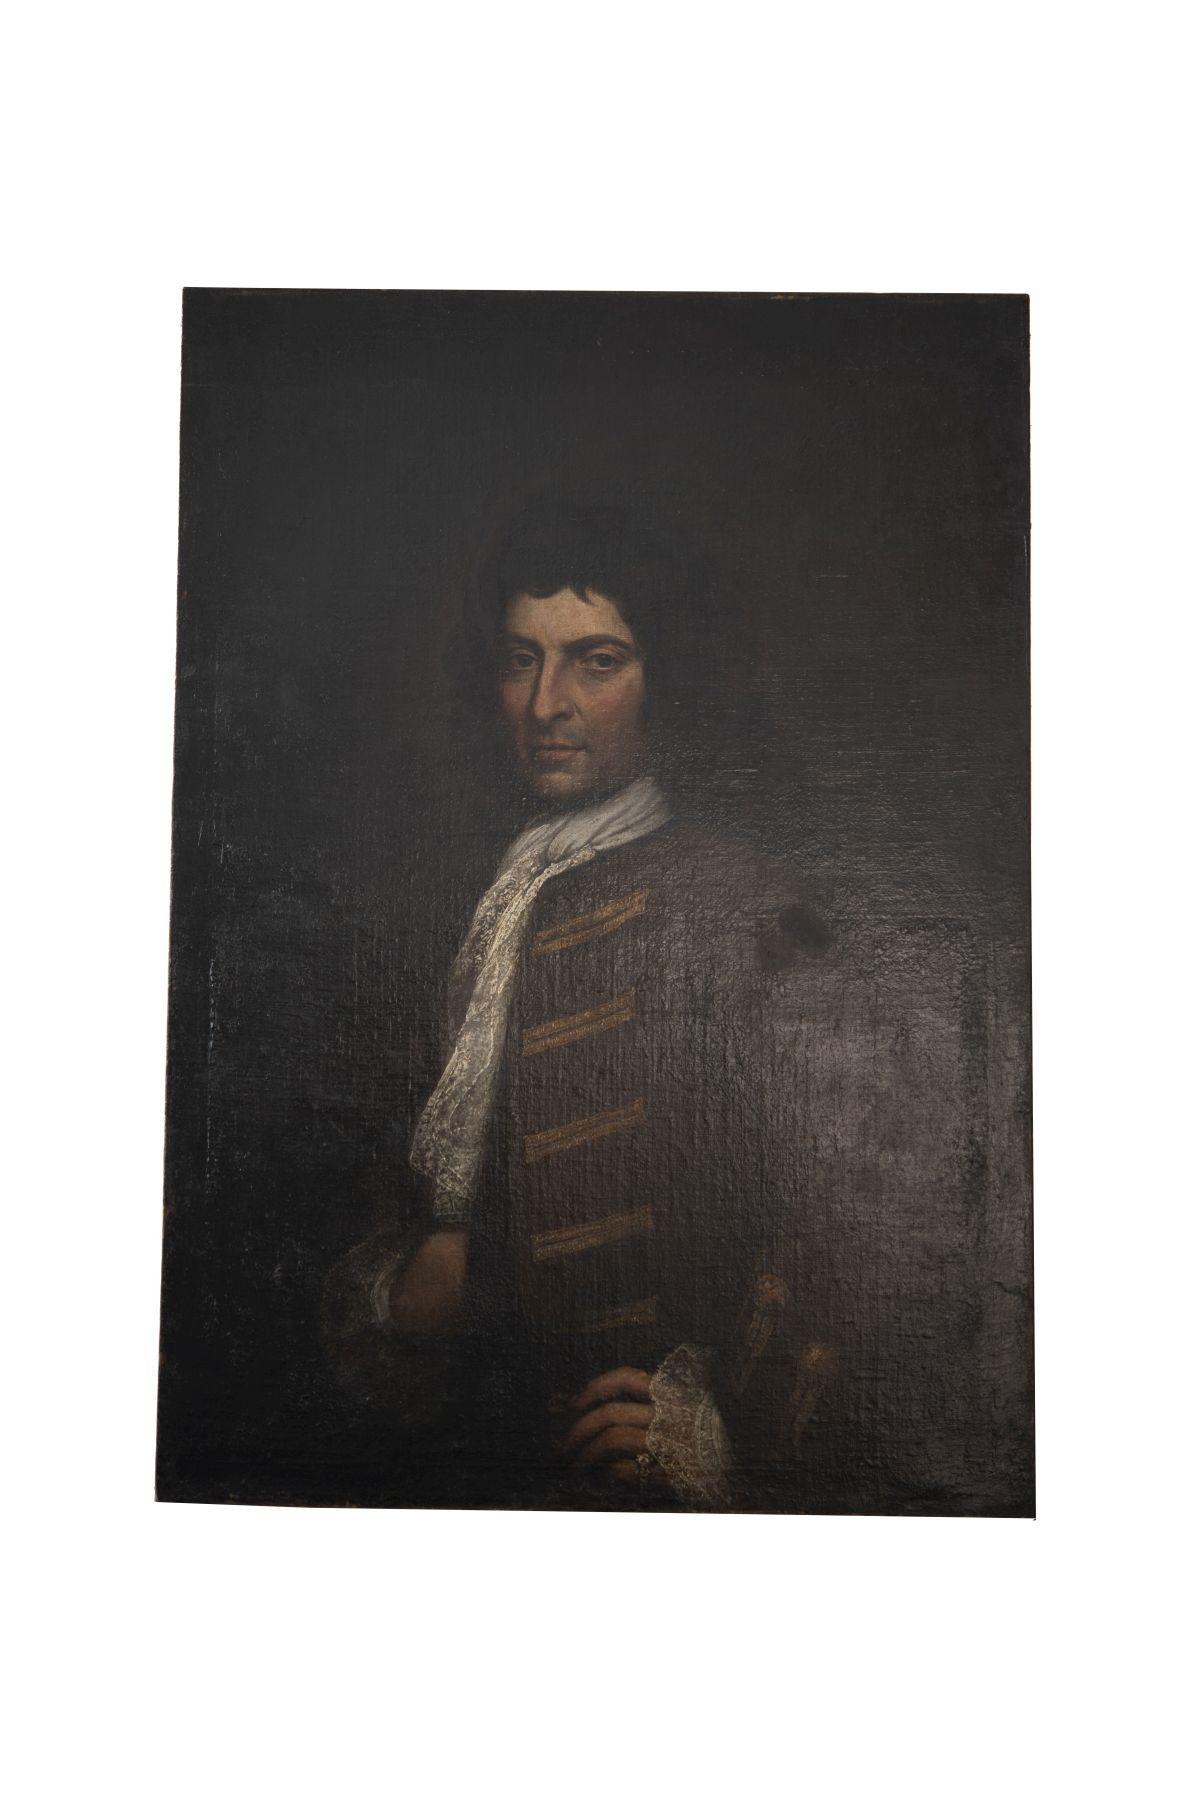 #106 Portrait of a nobleman | Porträt eines Adeligen Image